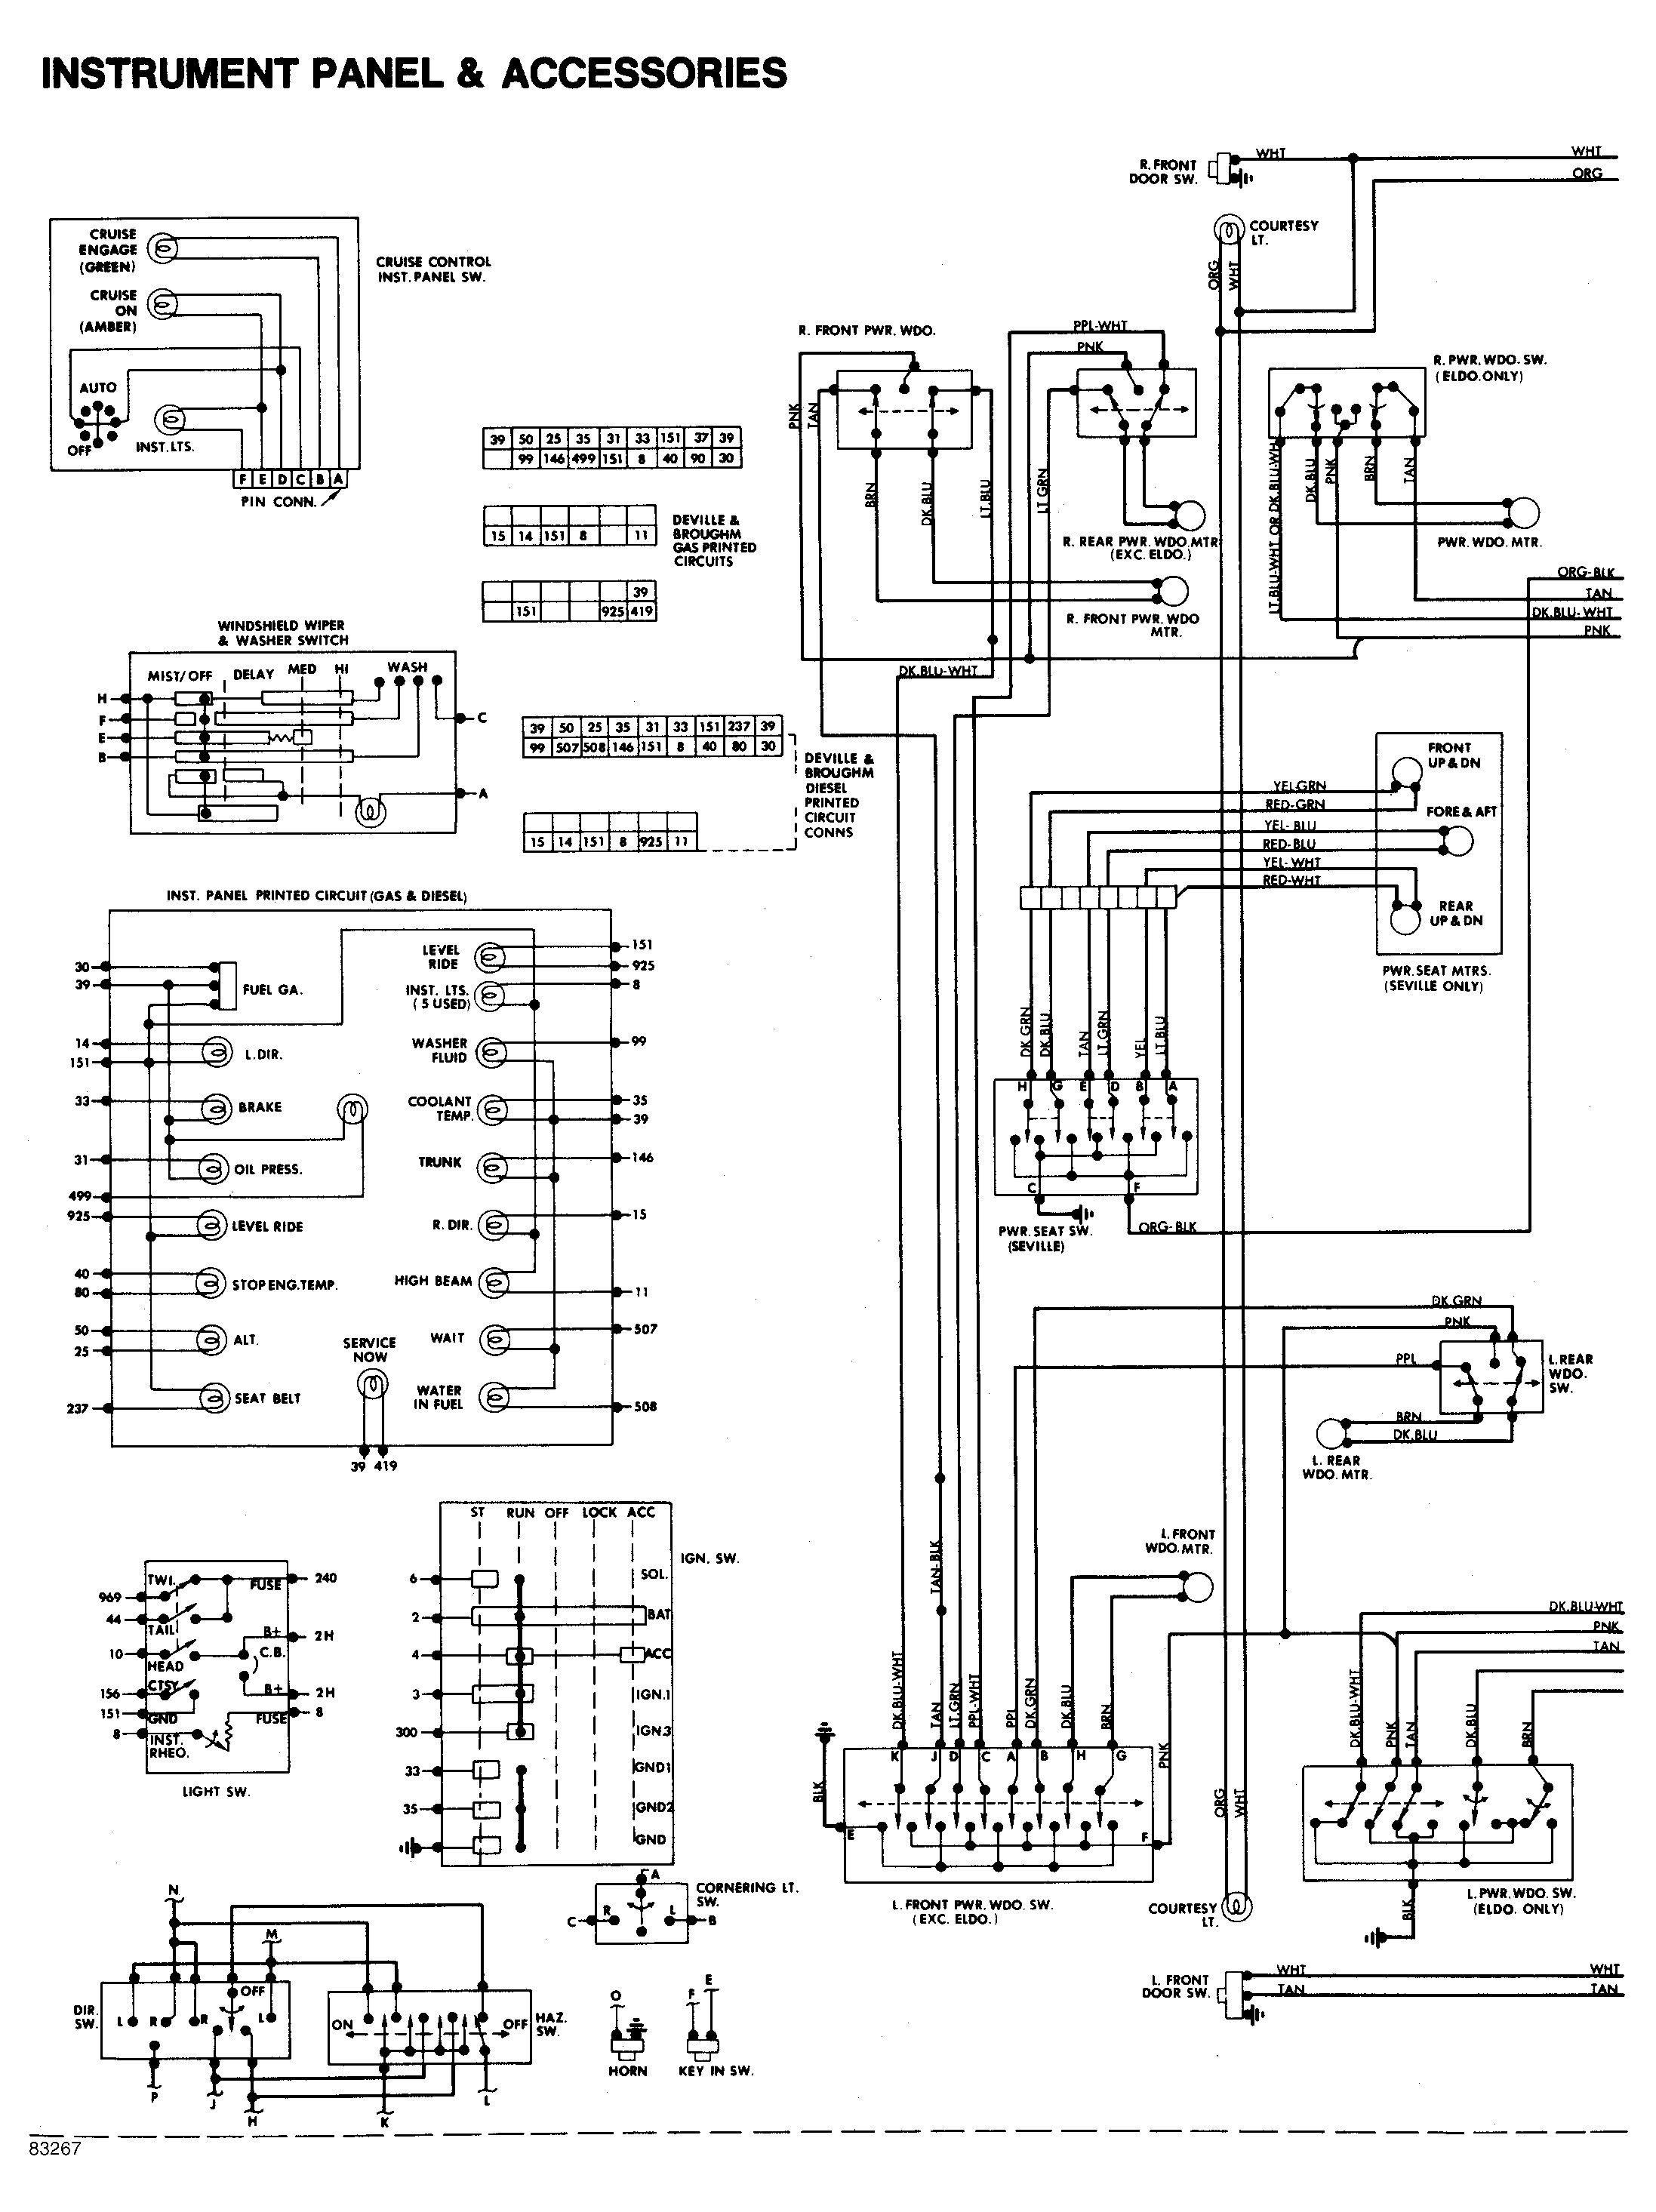 77 New 2000 Honda Accord Radio Wiring Diagram Electrical Wiring Diagram Electrical Diagram Diagram Design